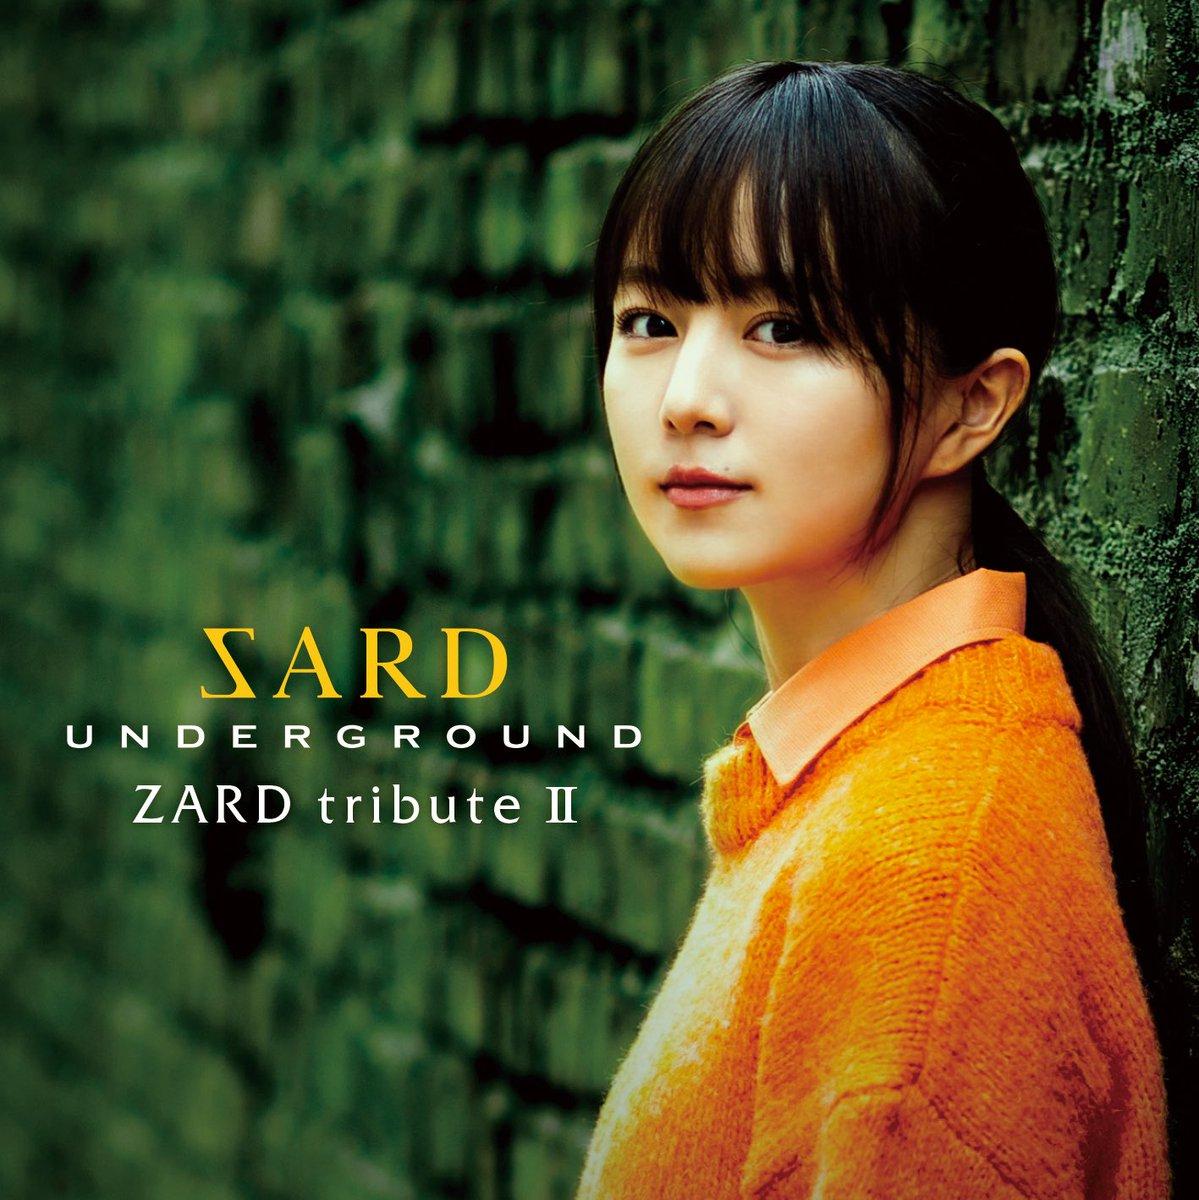 『SARD UNDERGROUND - 眠れない夜を抱いて』収録の『ZARD tribute Ⅱ』ジャケット